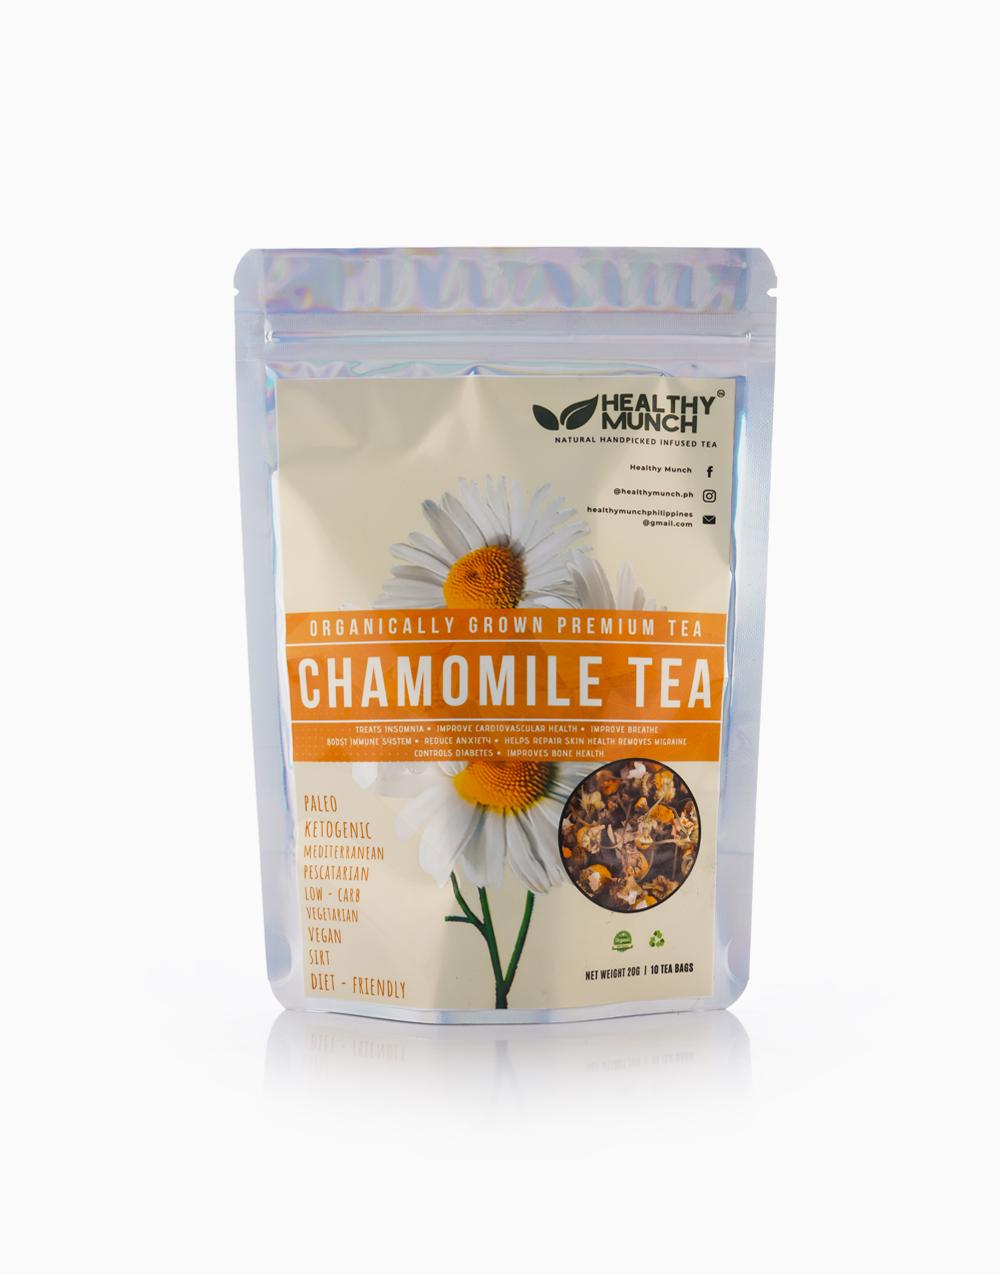 Chamomile Tea (20g) by Healthy Munch